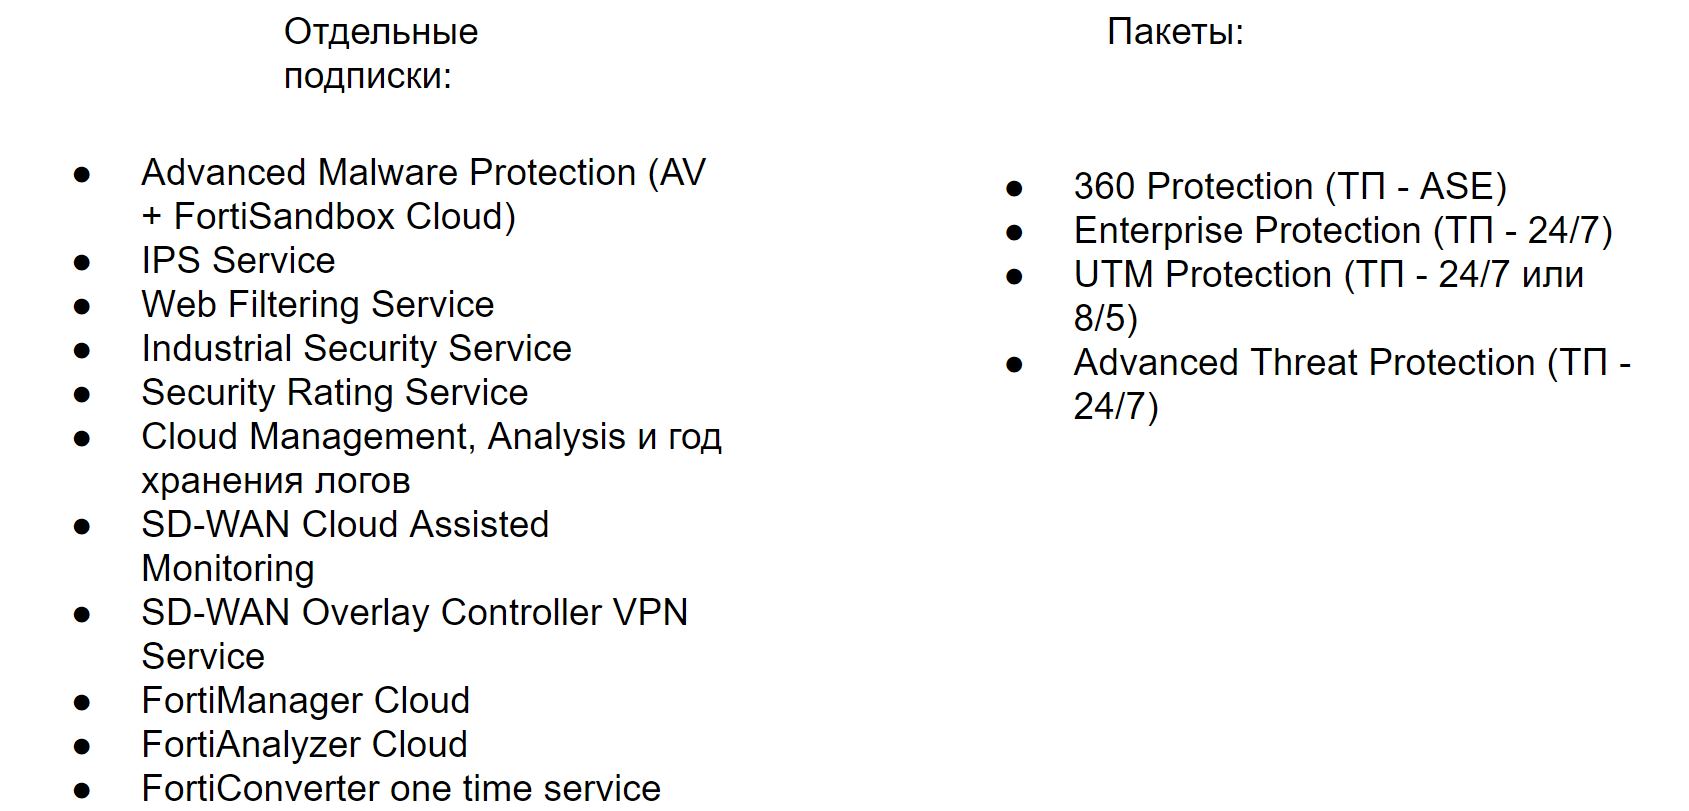 11. Fortinet Getting Started v6.0. Лицензирование - 3